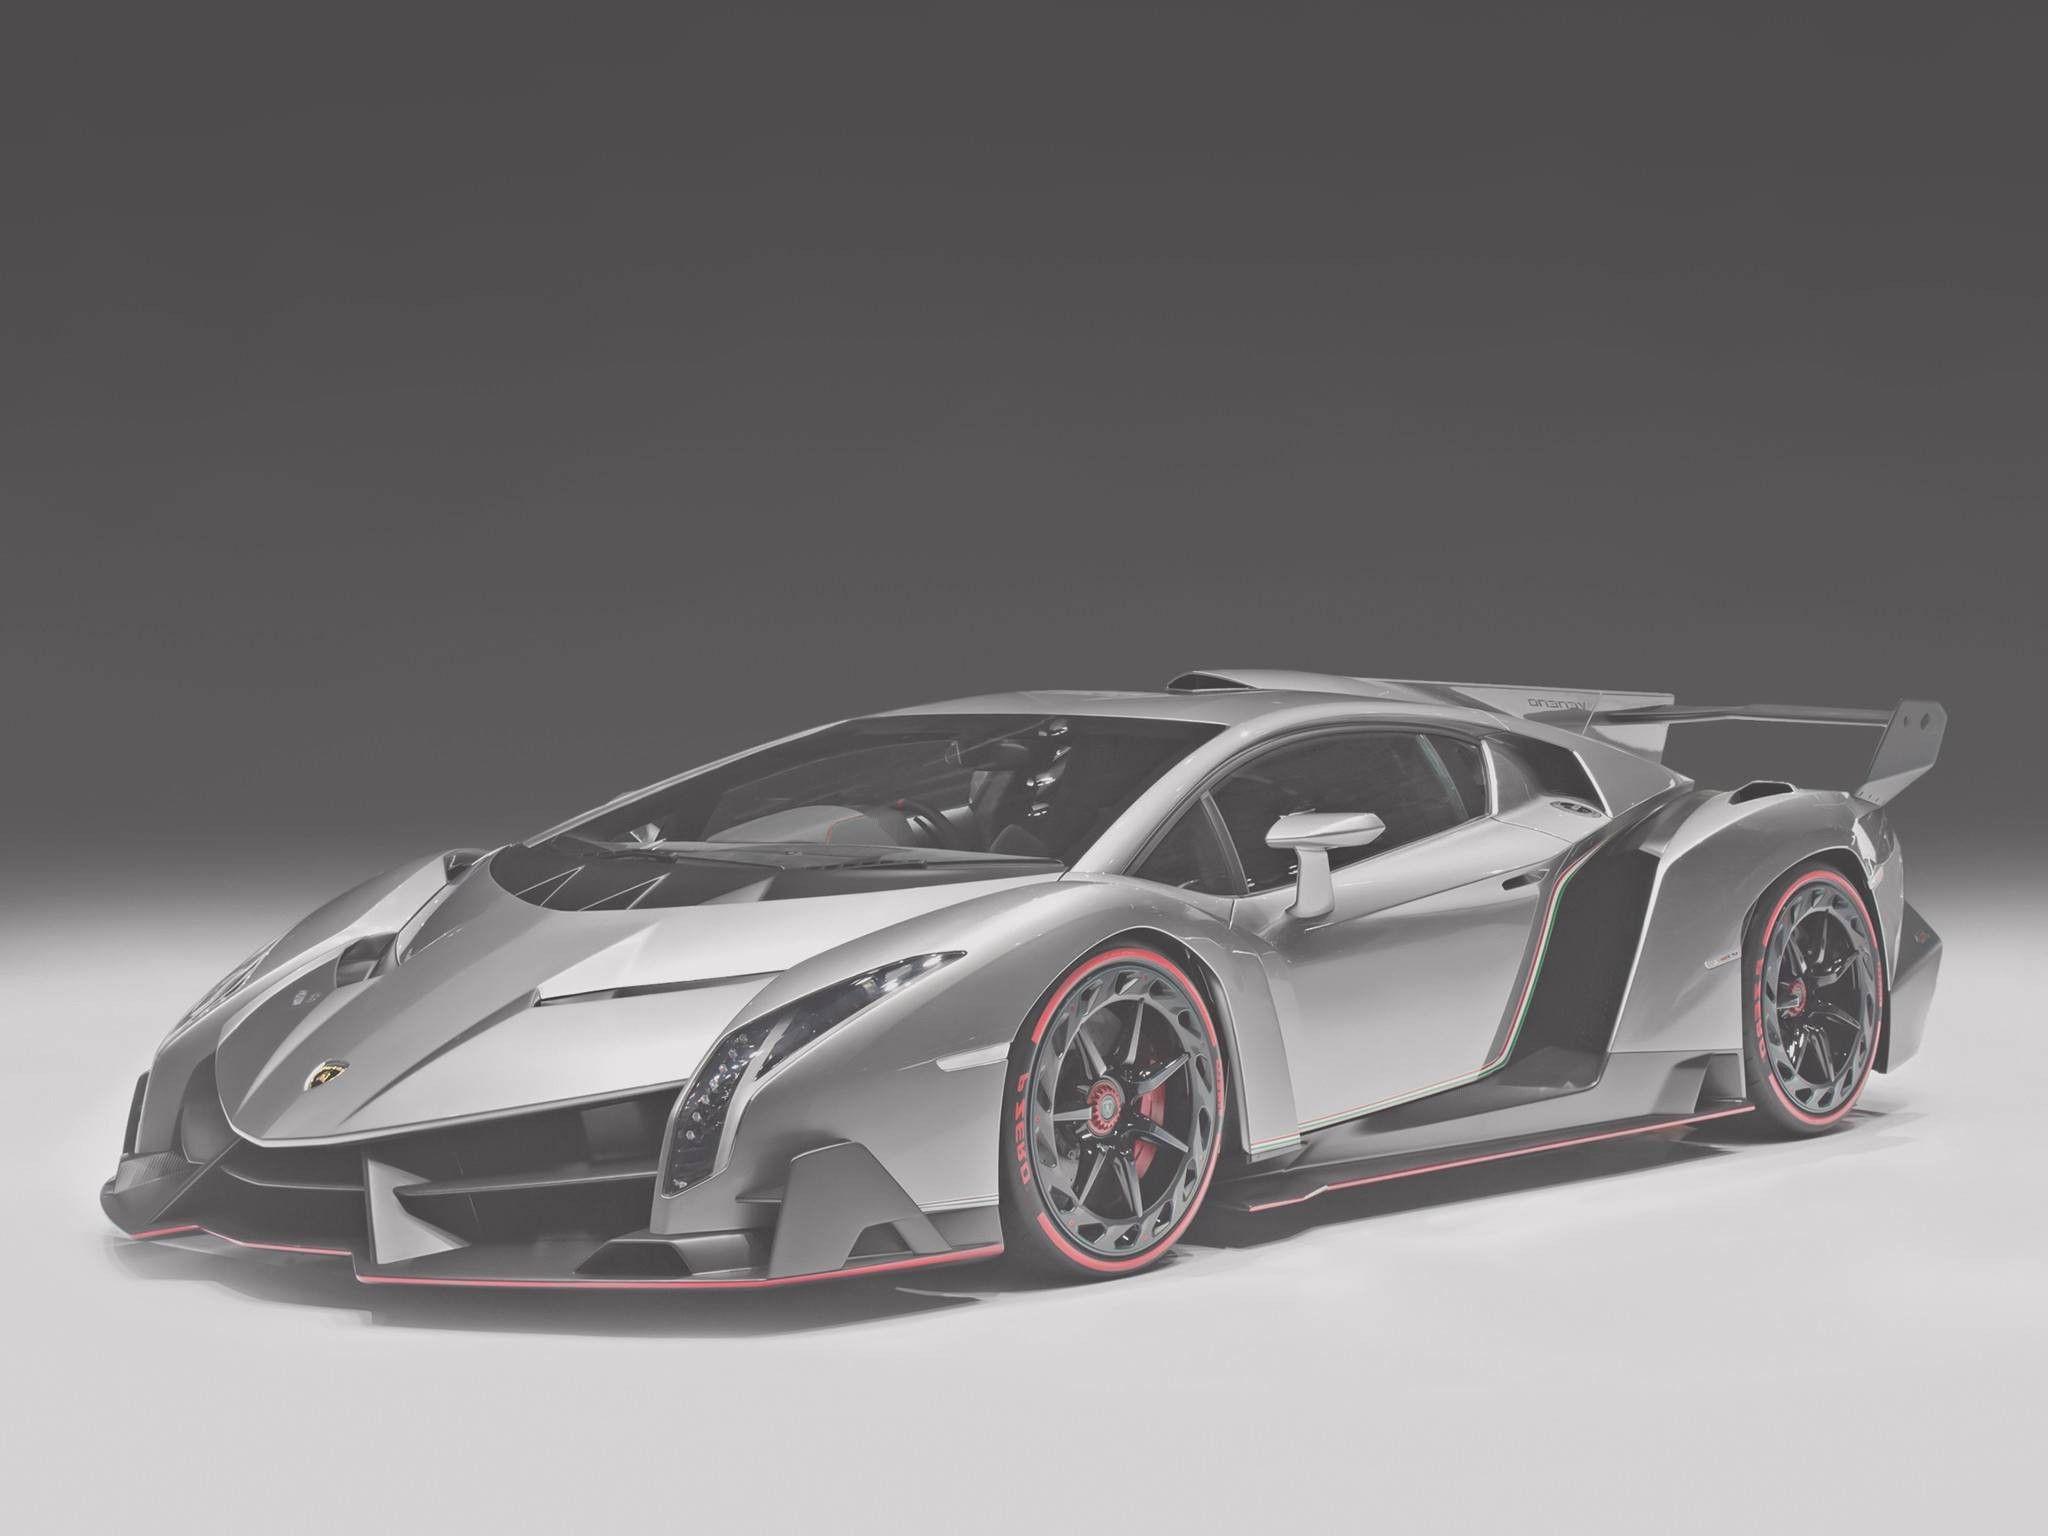 18 Neu Lamborghini Zum Ausmalen Galerie  Superauto, Lamborghini